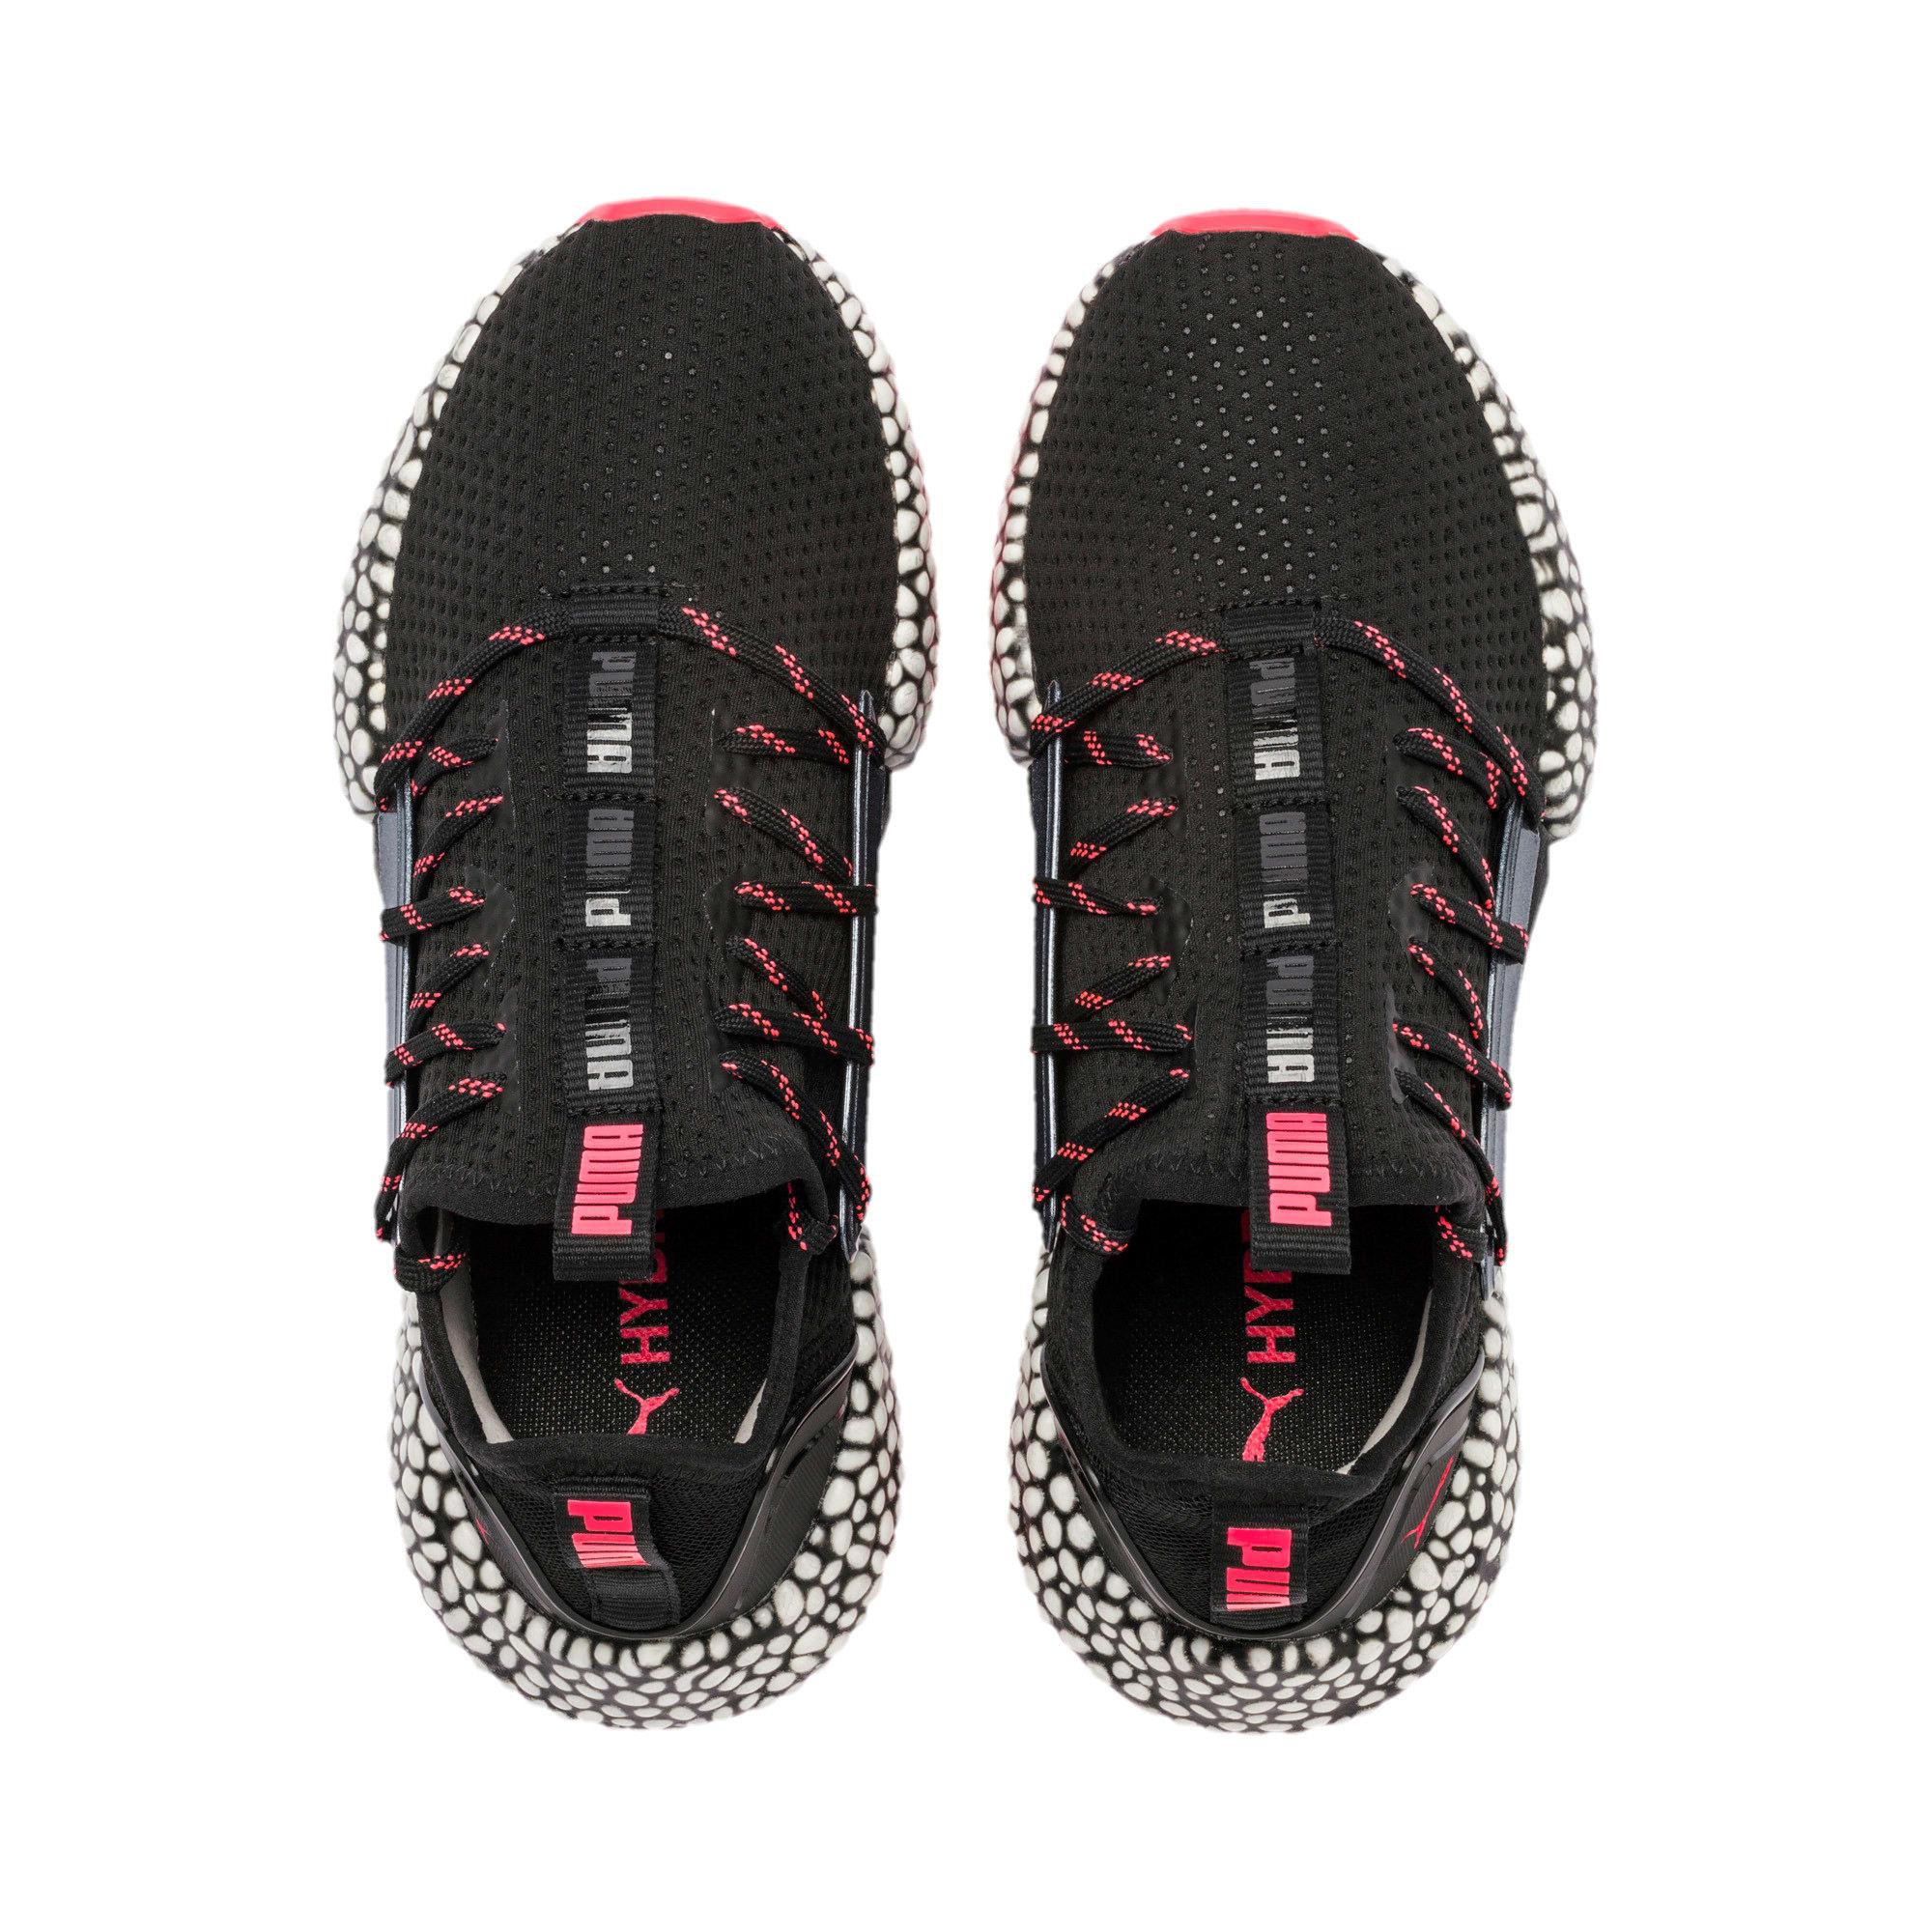 Thumbnail 7 of HYBRID Rocket Aero Women's Sneakers, Puma Black-Pink Alert, medium